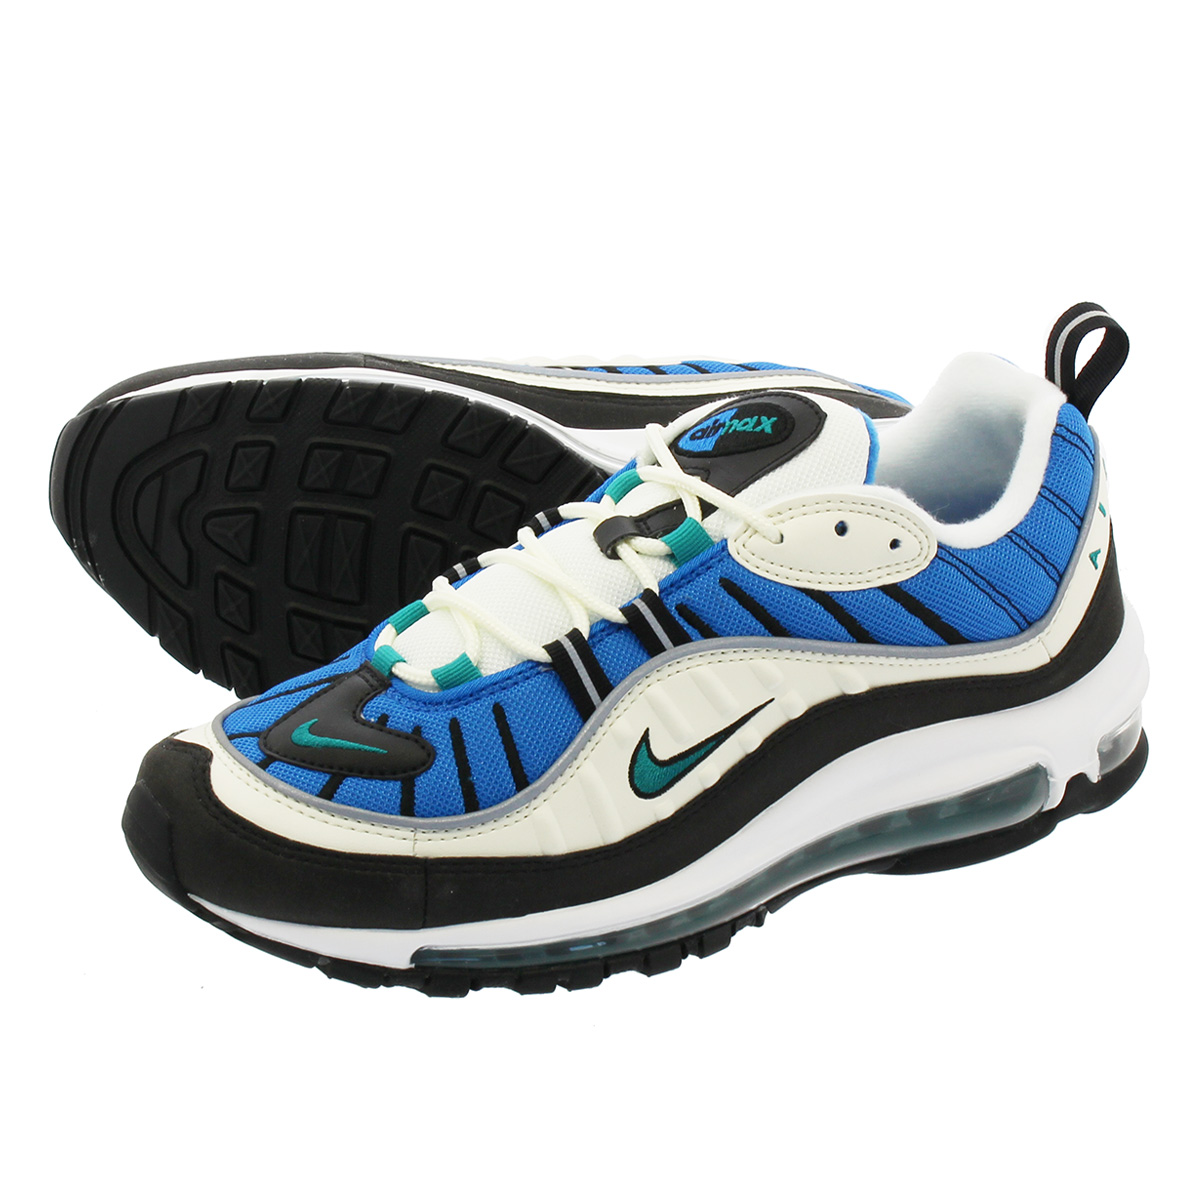 watch 4cefb bbf94 NIKE WMNS AIR MAX 98 Nike women Air Max 98 SAIL/RADIANT EMERALD/BLUE NEBULA  ah6799-106